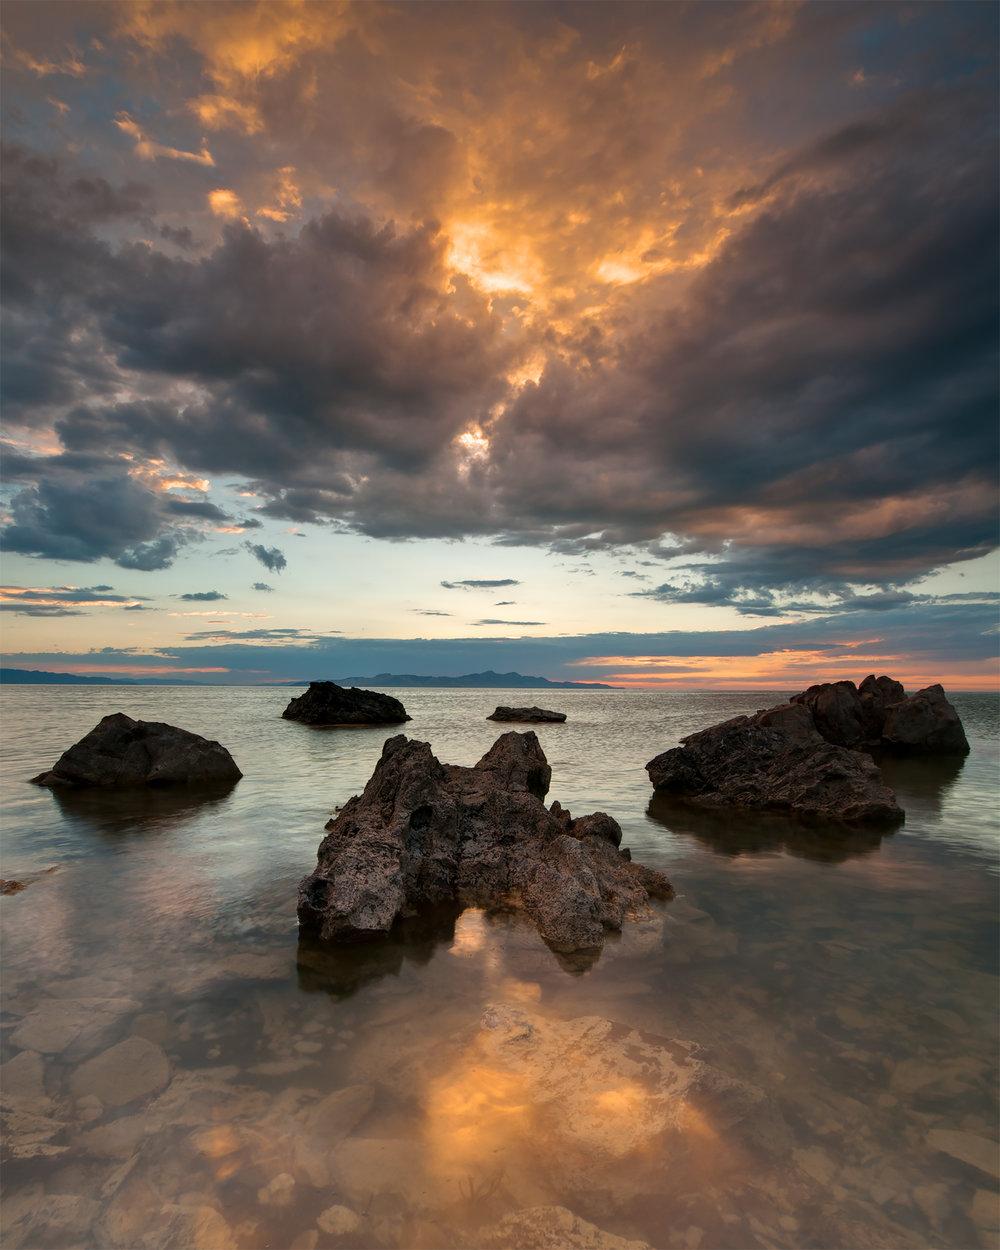 Golden Skies Over the Great Salt Lake